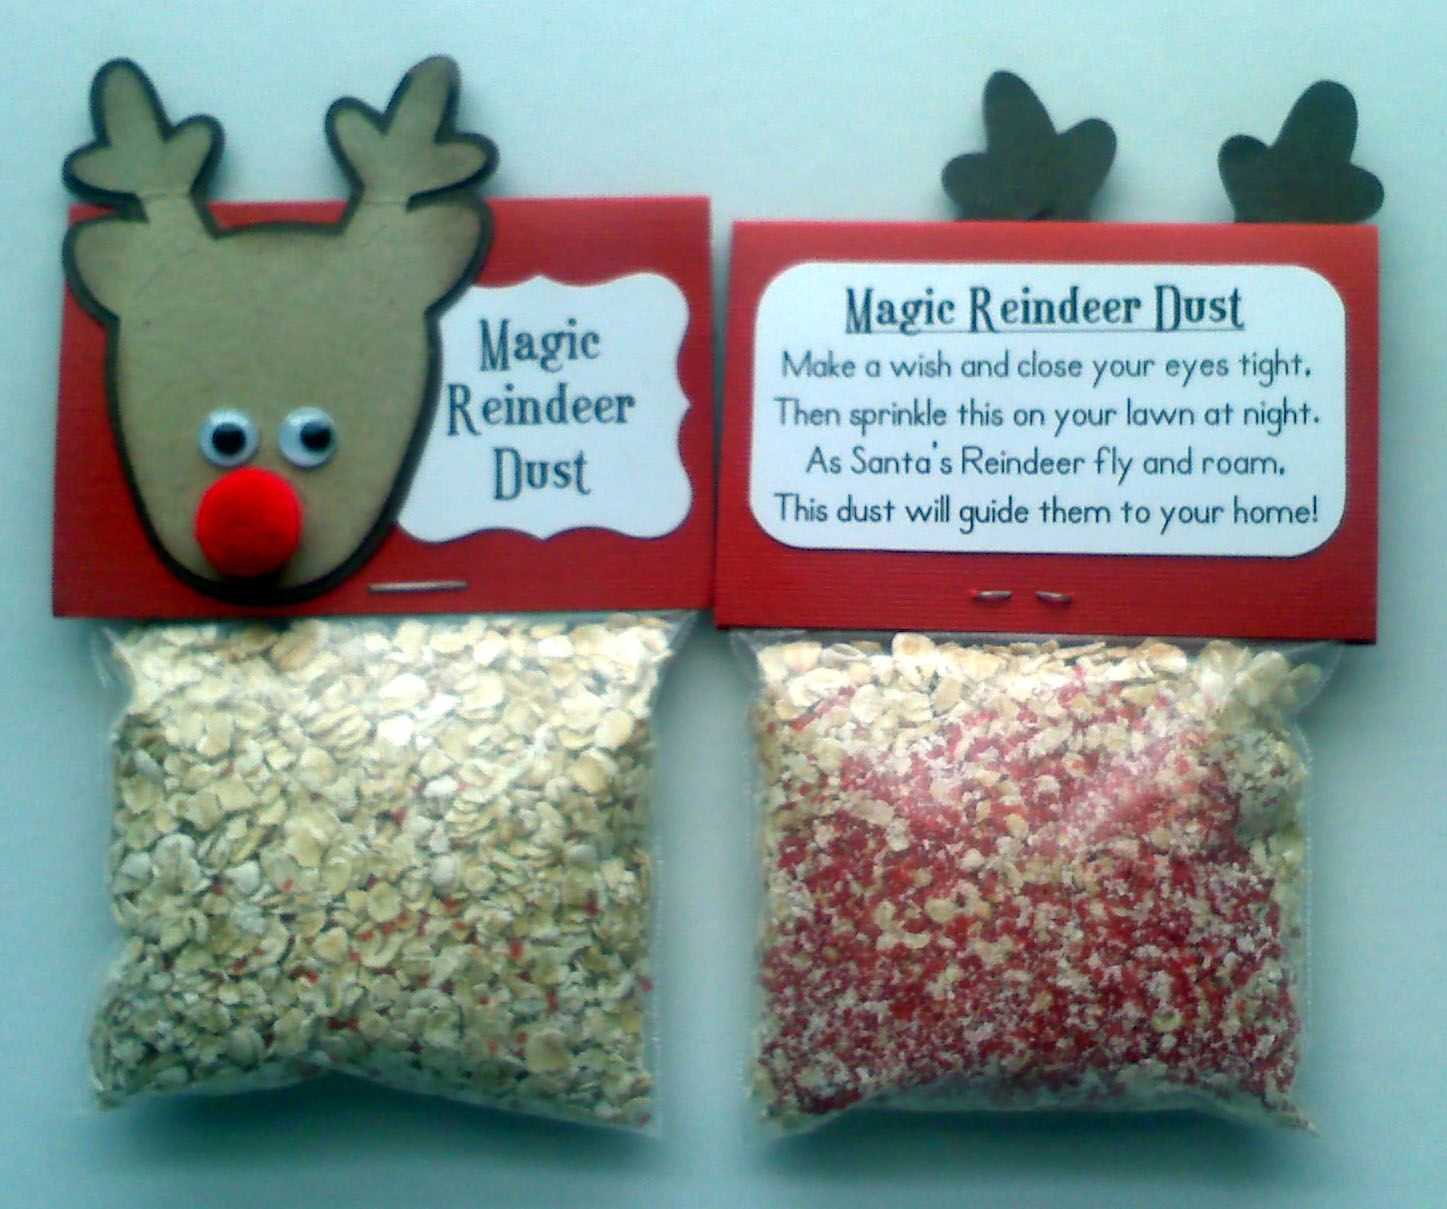 Magic Reindeer Dust